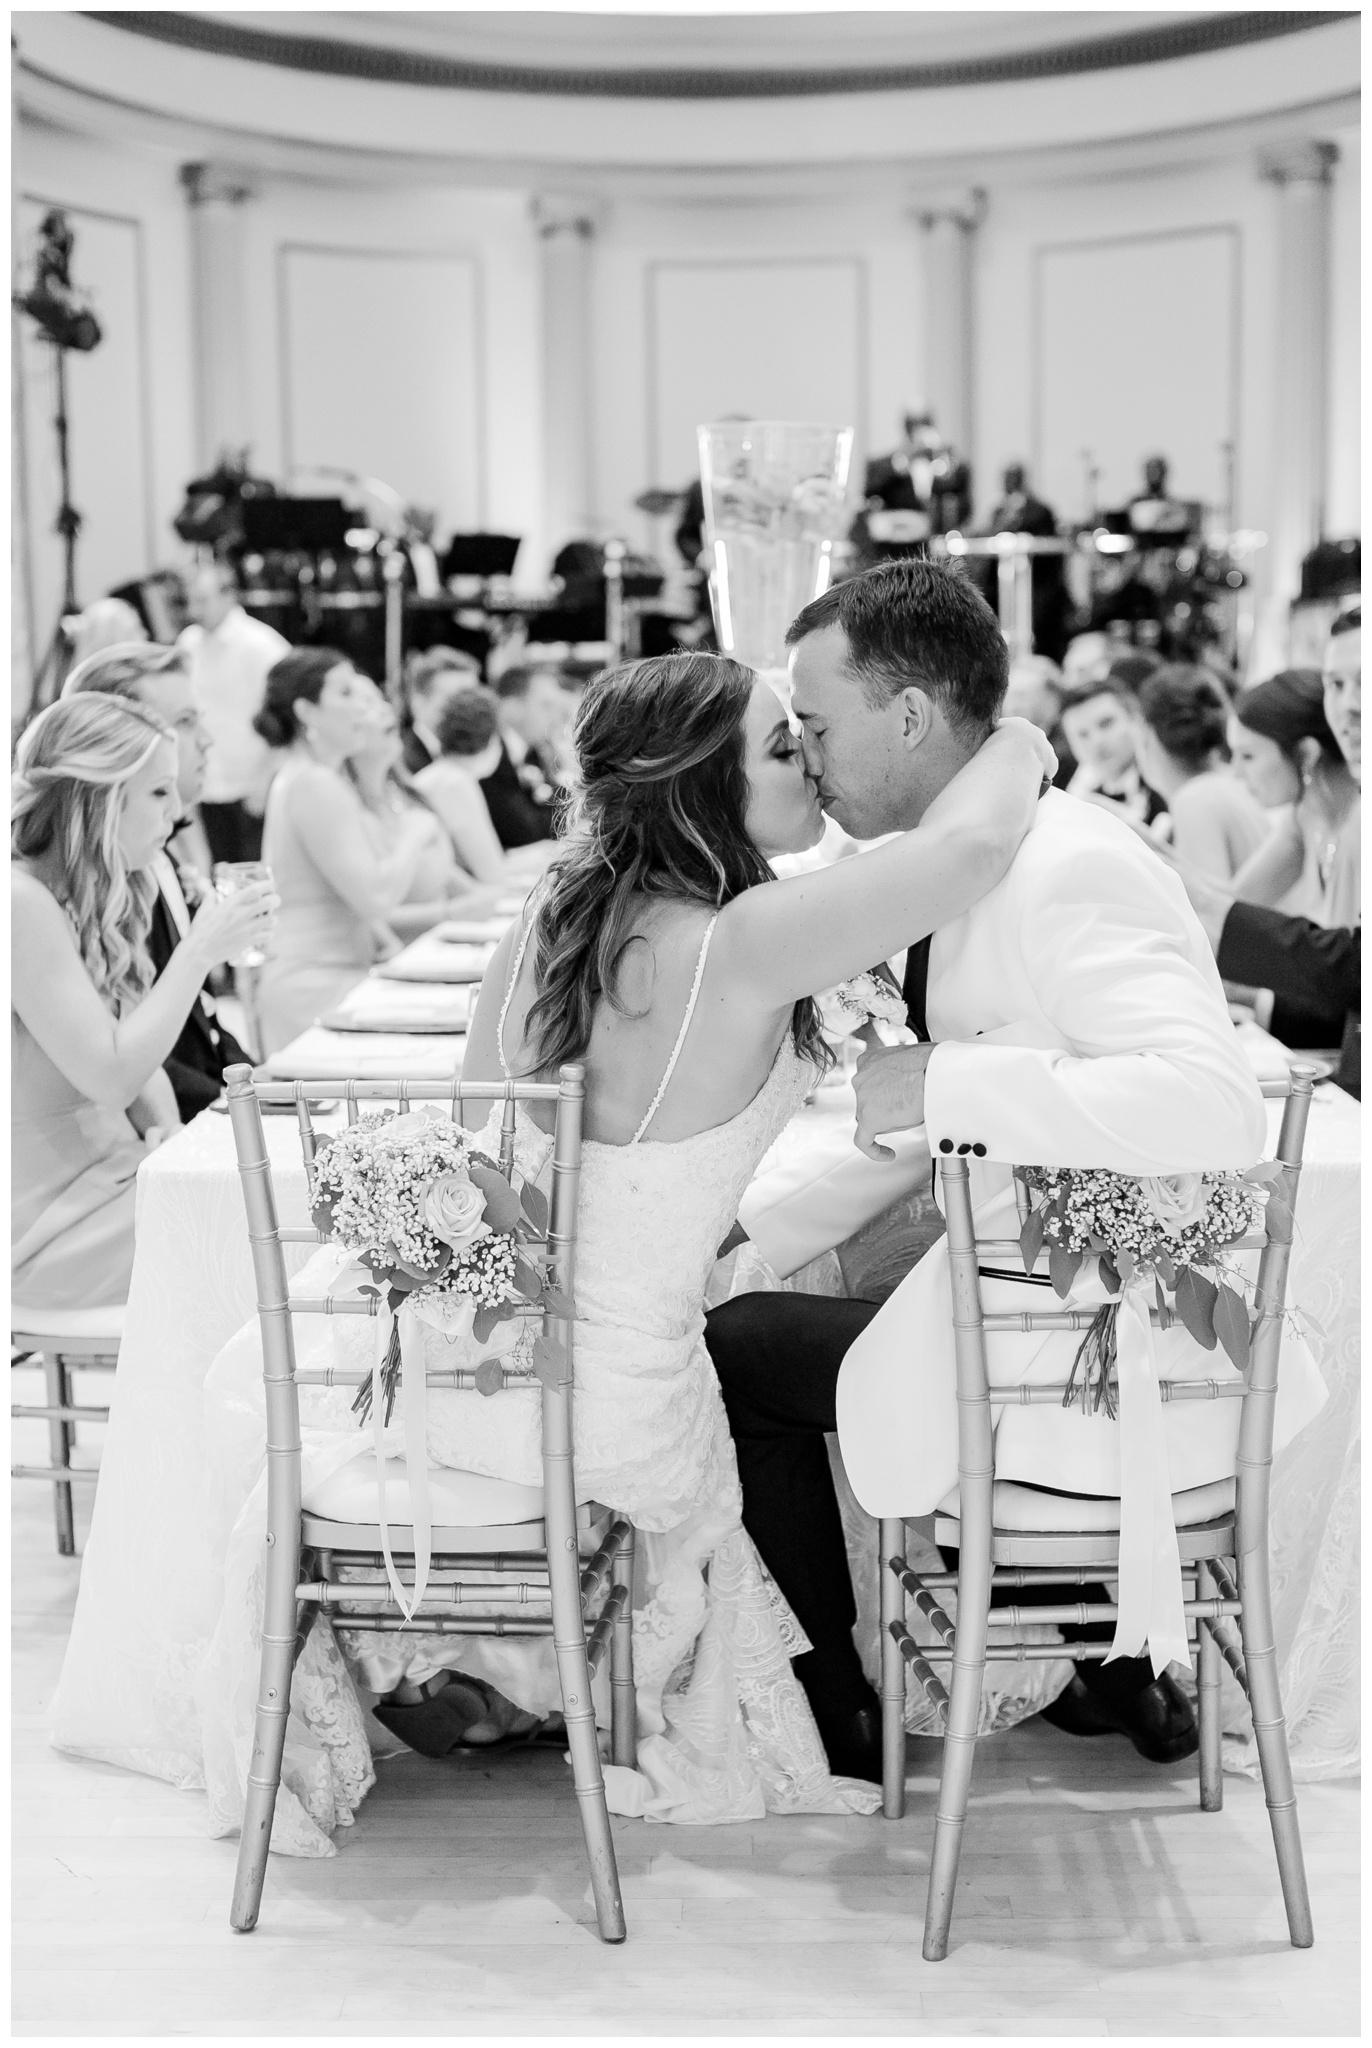 UW_Memorial_Union_wedding_madison_wisconsin_wedding_photographers_4634.jpg